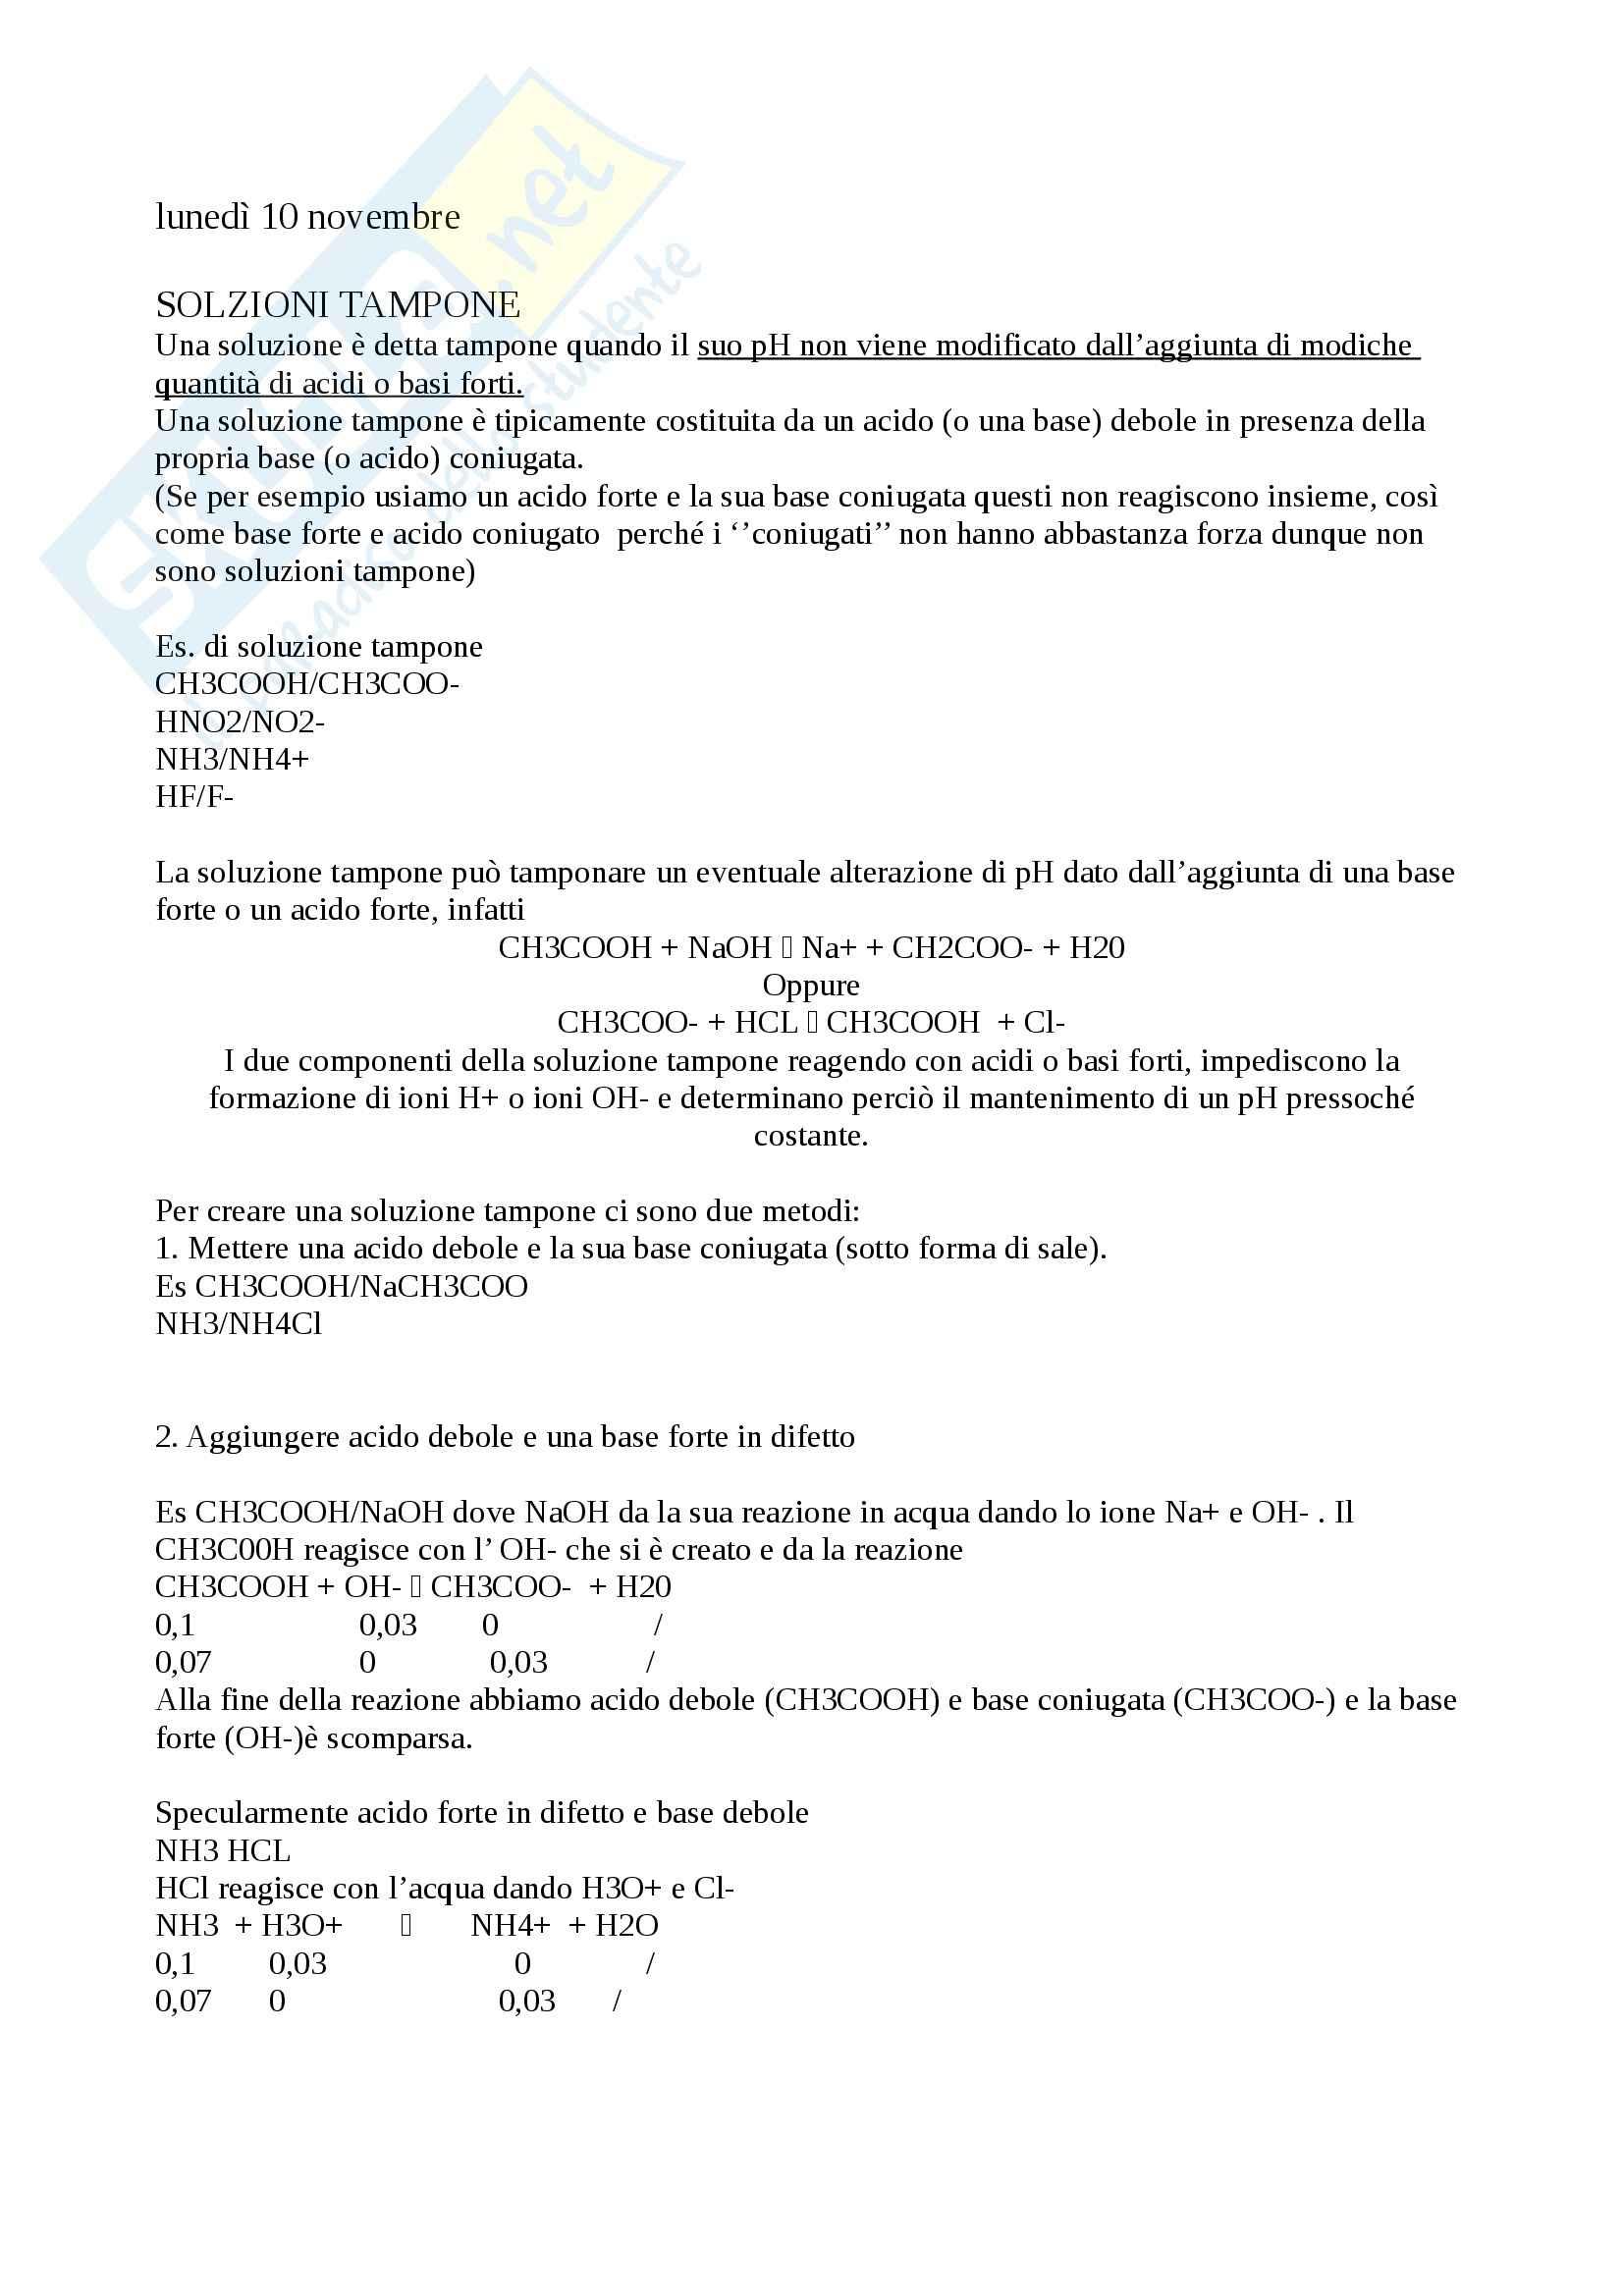 Soluzioni tampone, Chimica generale e inorganica